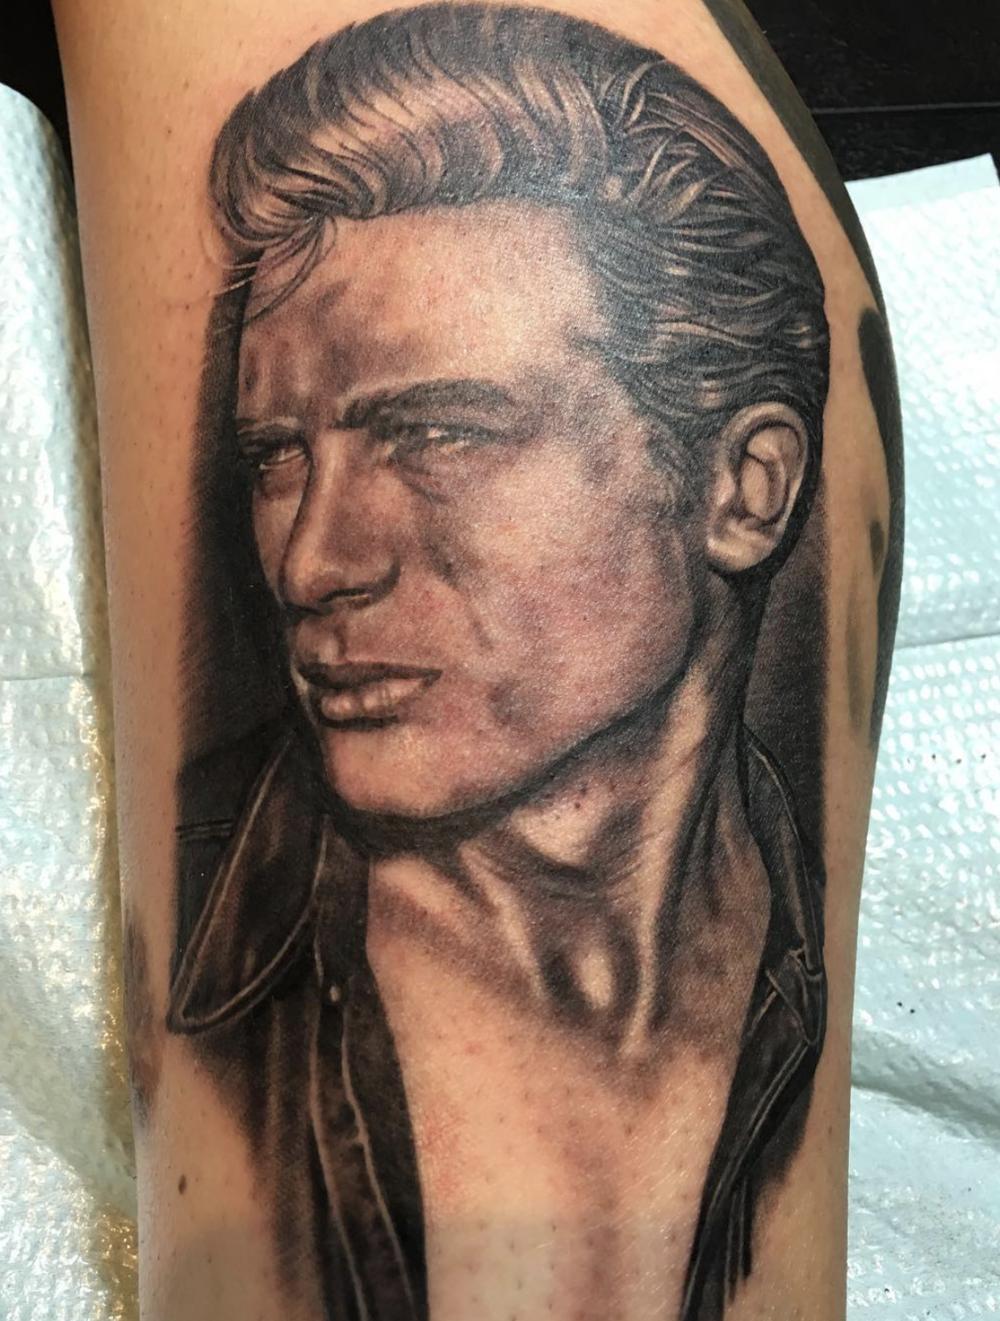 Jared Weippert - North Street Tattoo